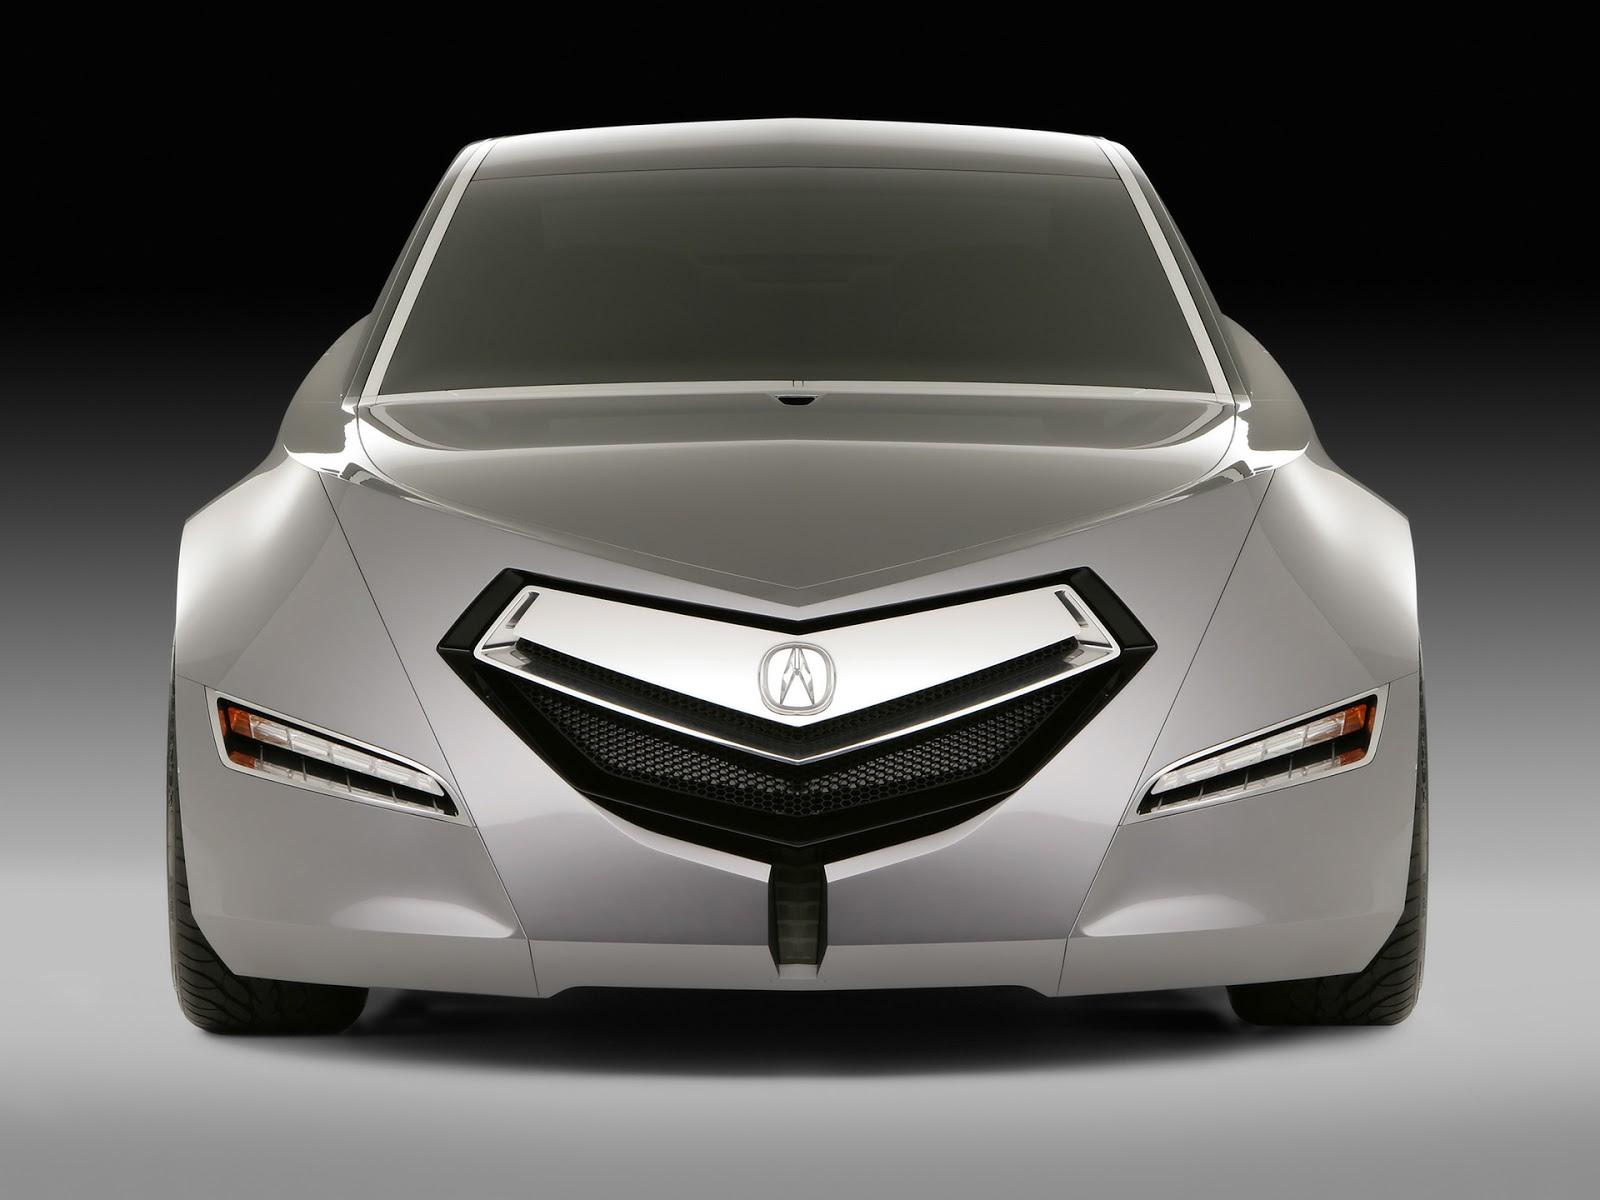 2006 acura advanced sedan concept wallpapers auto cars concept2006 acura advanced sedan concept wallpapers